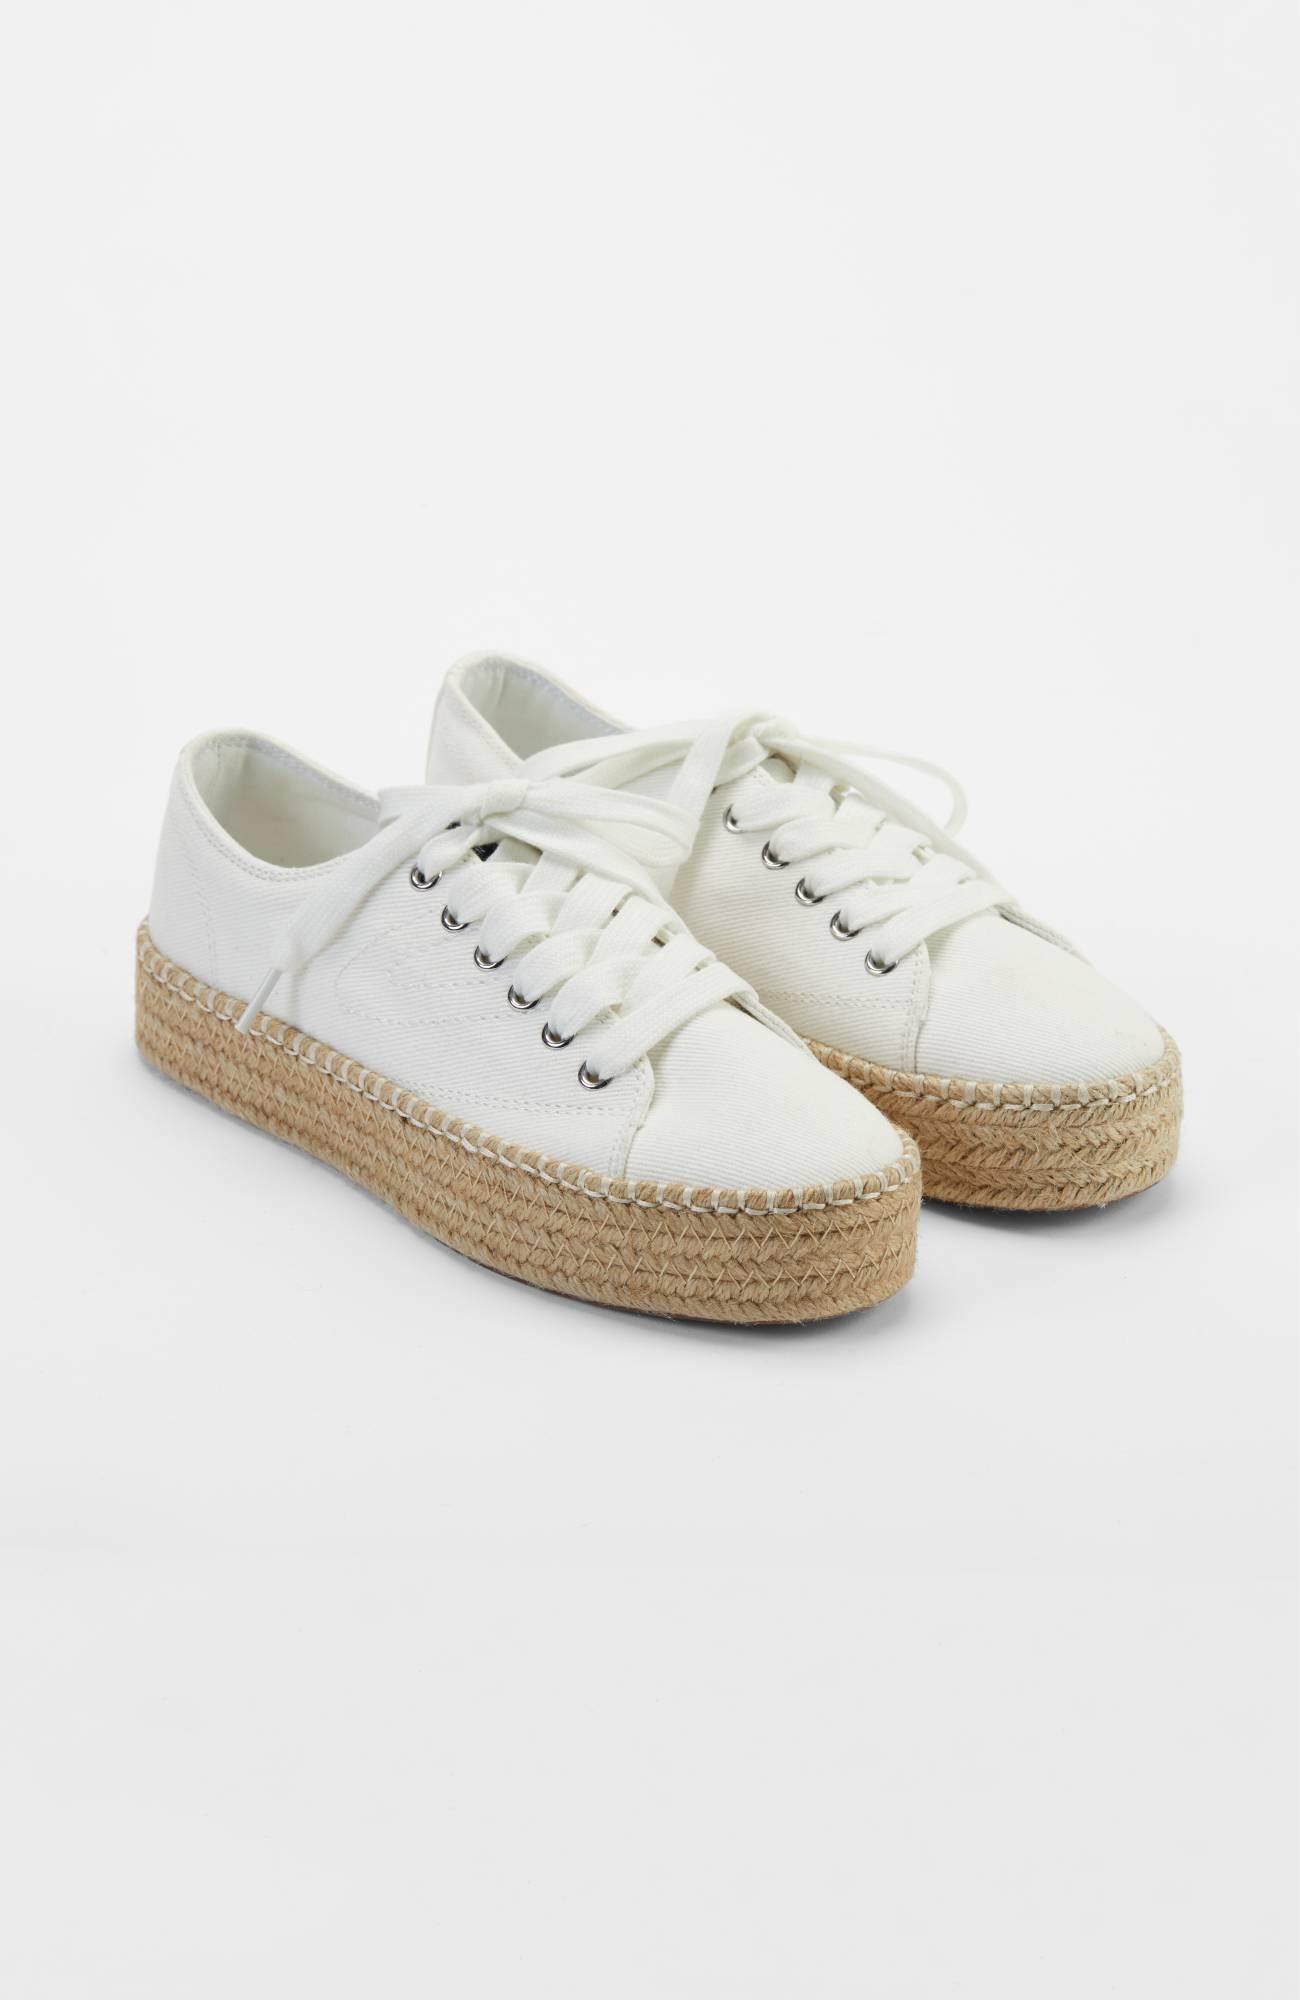 Tretorn® Eve Espadrille Sneakers | JJill